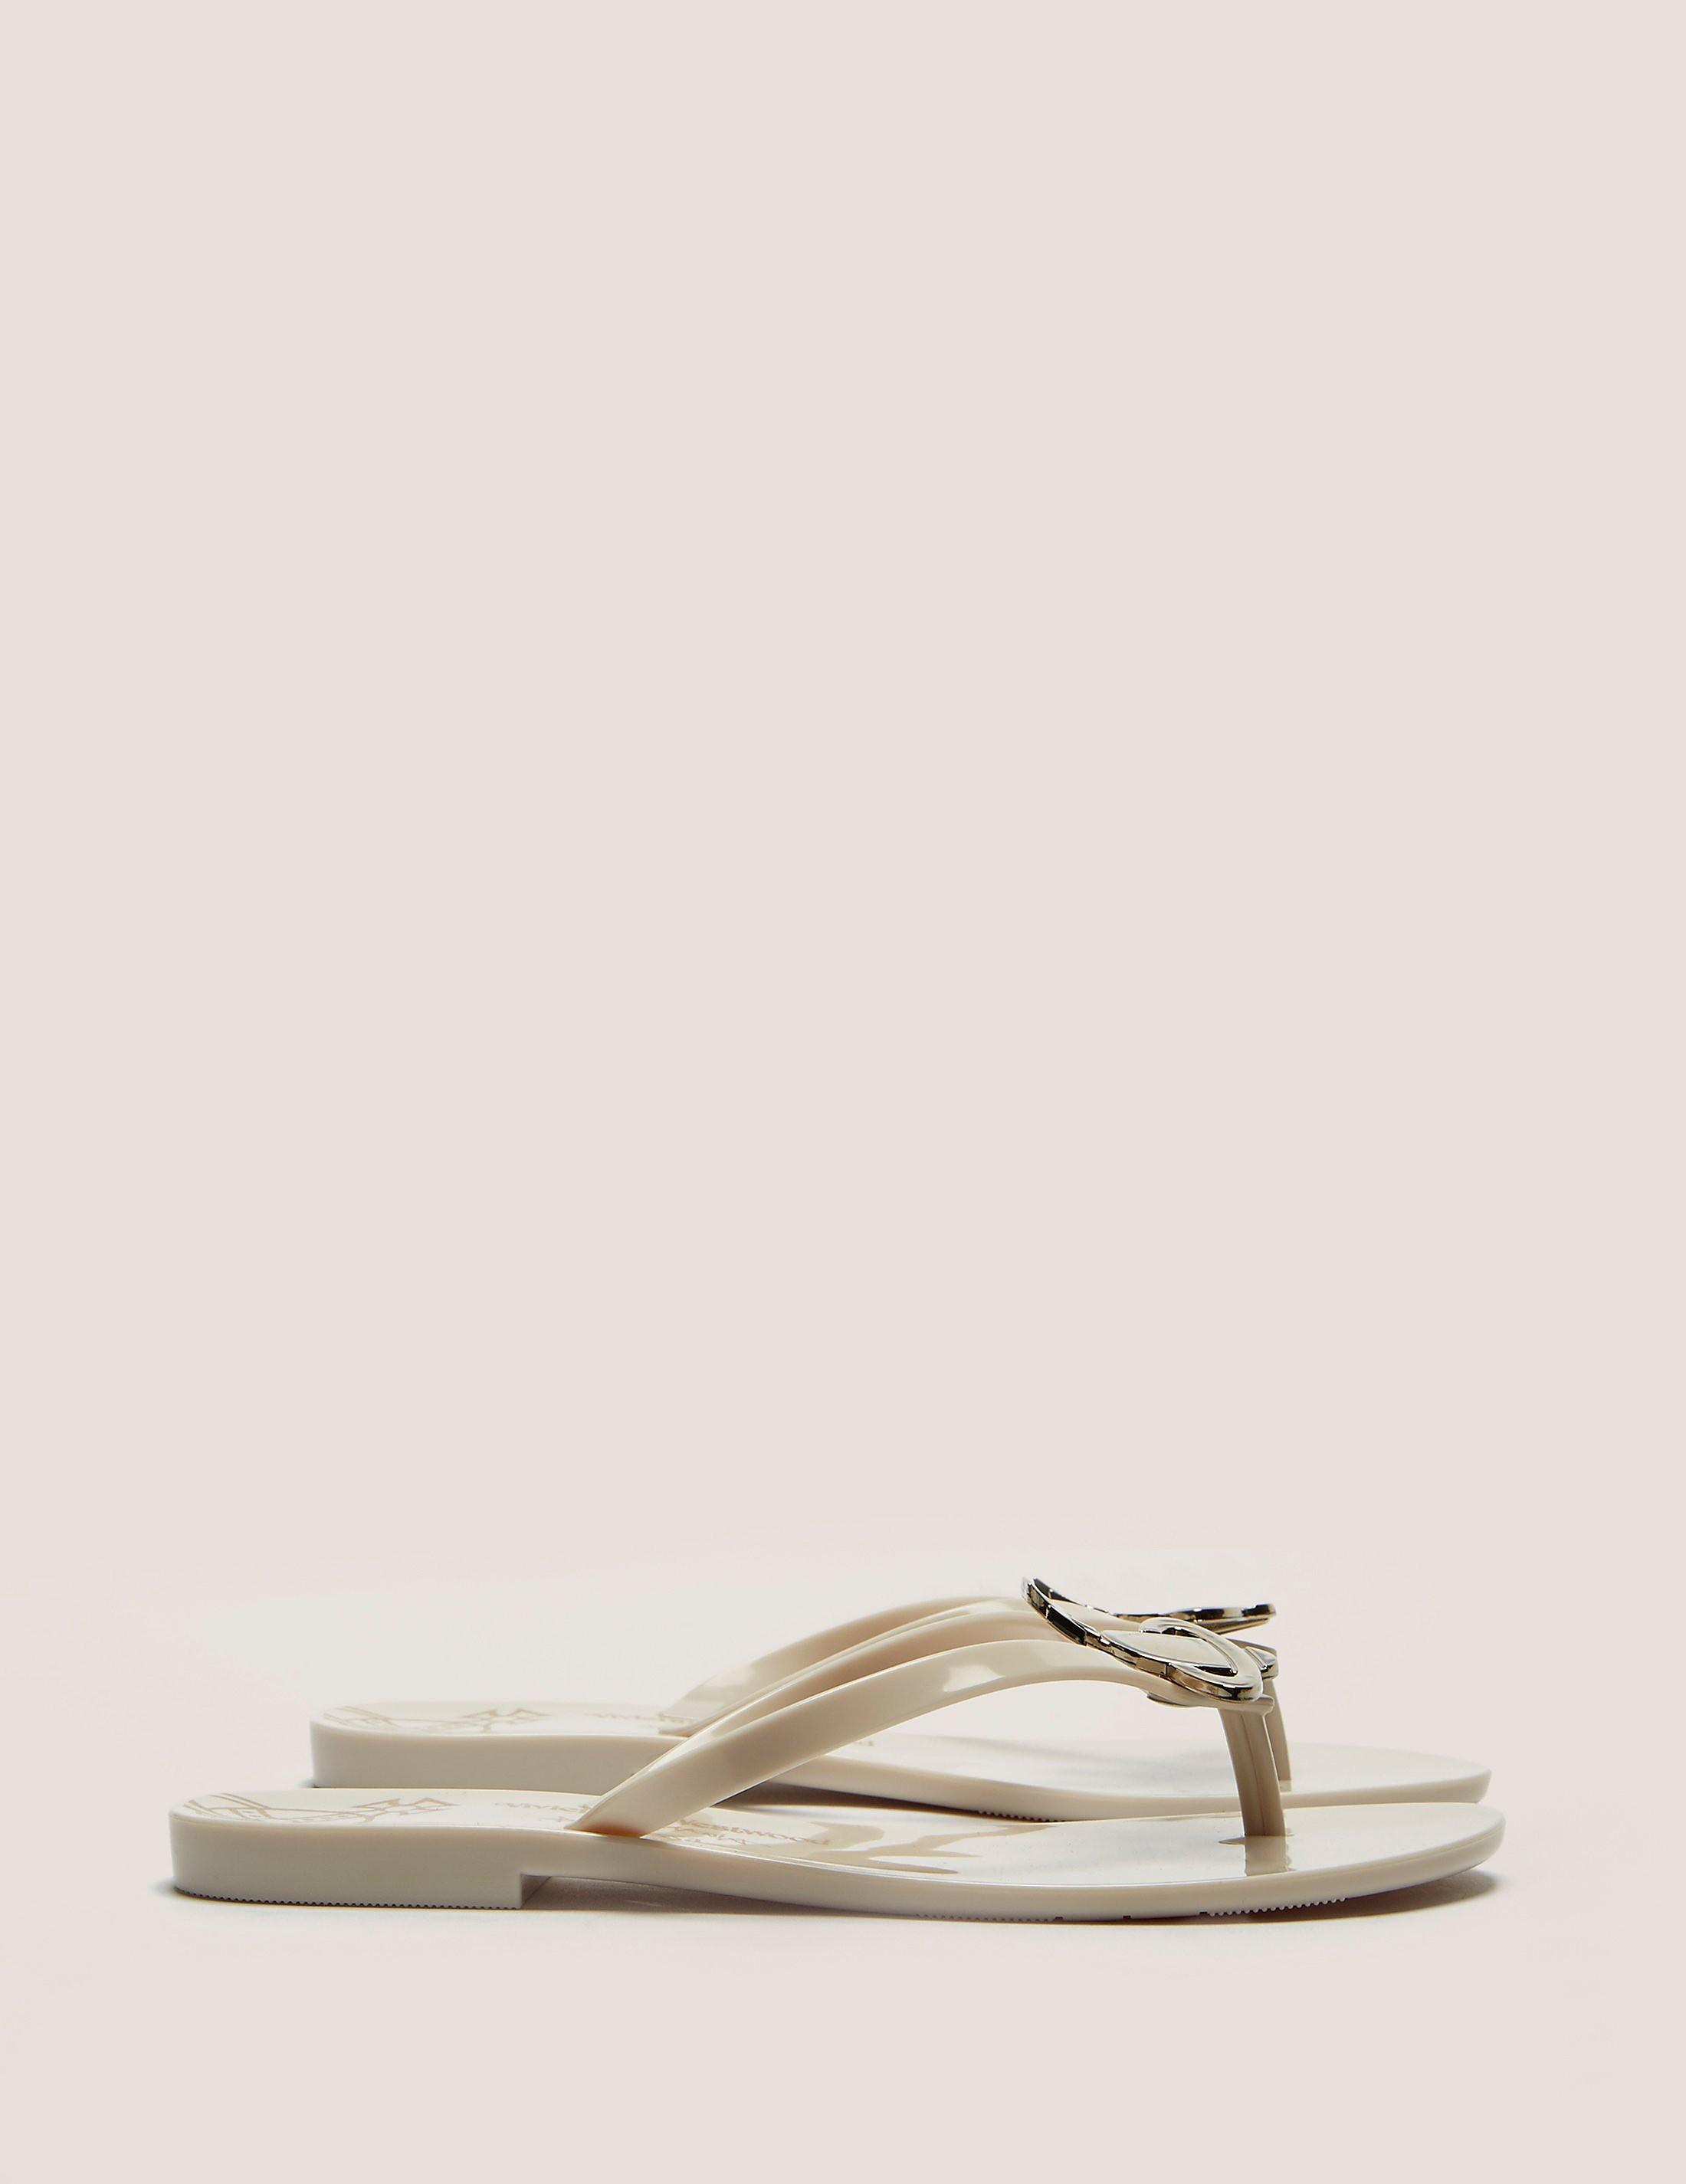 Melissa X Vivienne Westwood Orb Flip Flop